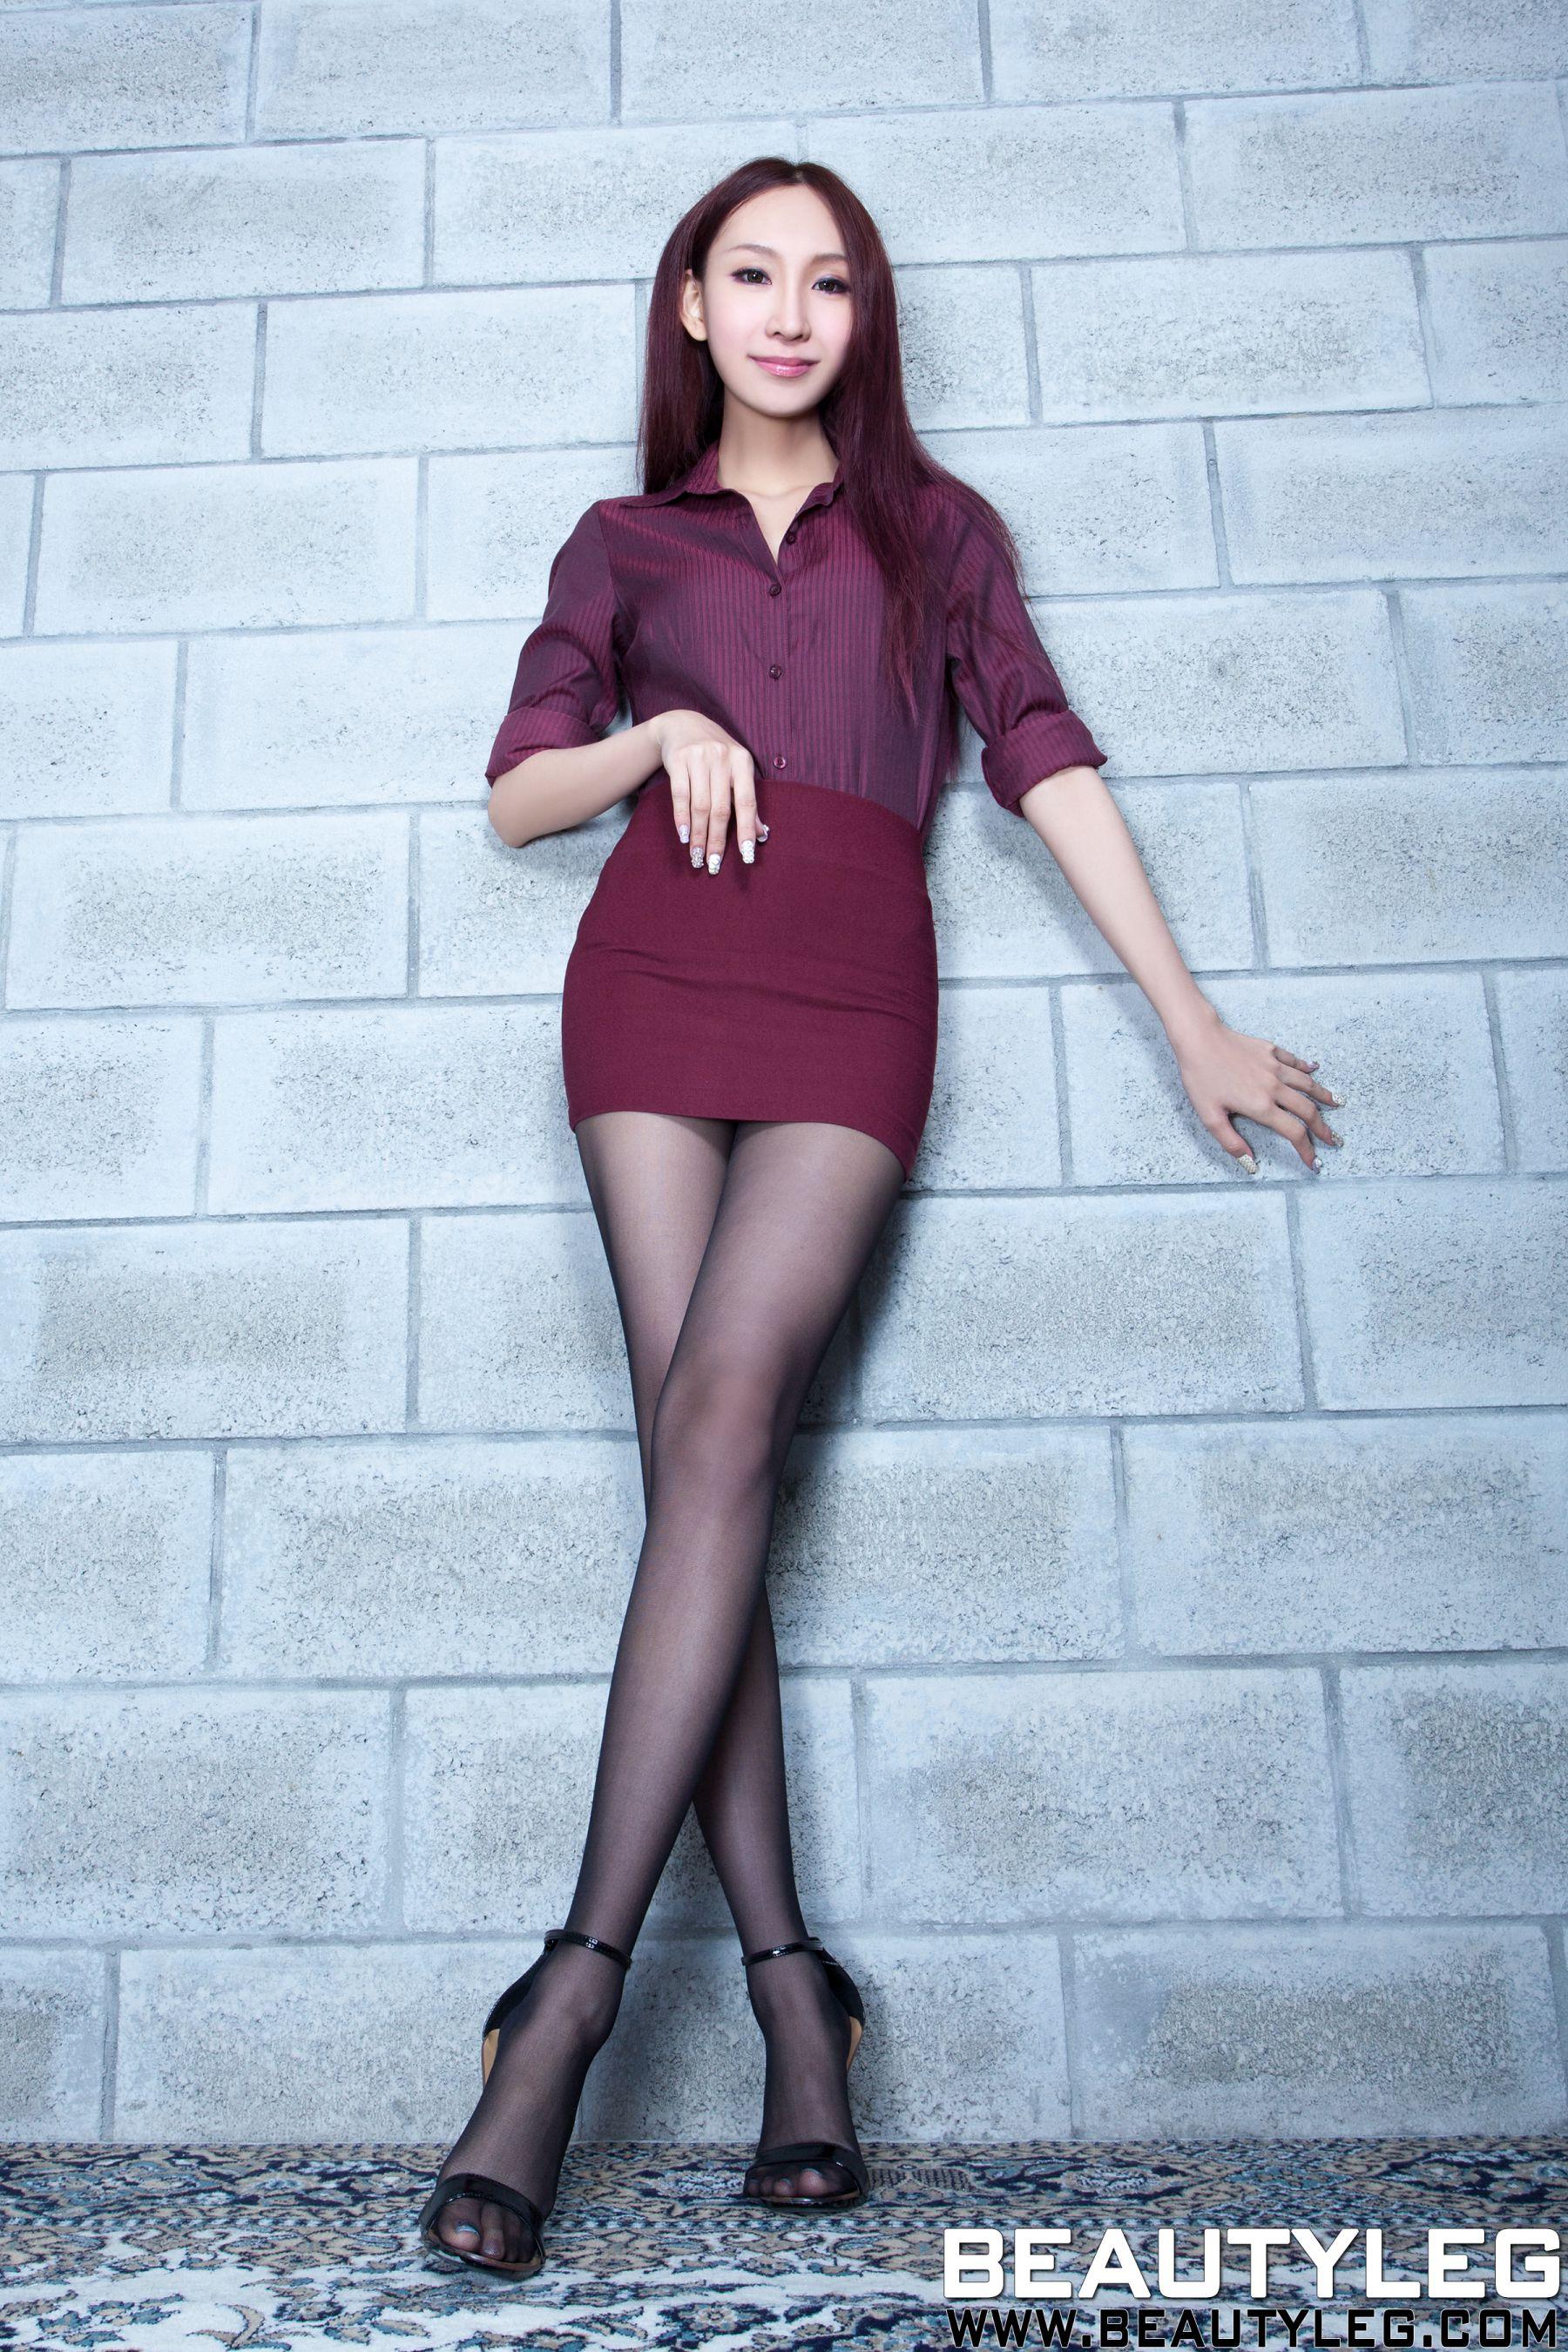 VOL.700 [Beautyleg]情趣丝袜高跟美腿:吴美希(腿模Miki)高品质写真套图(73P)